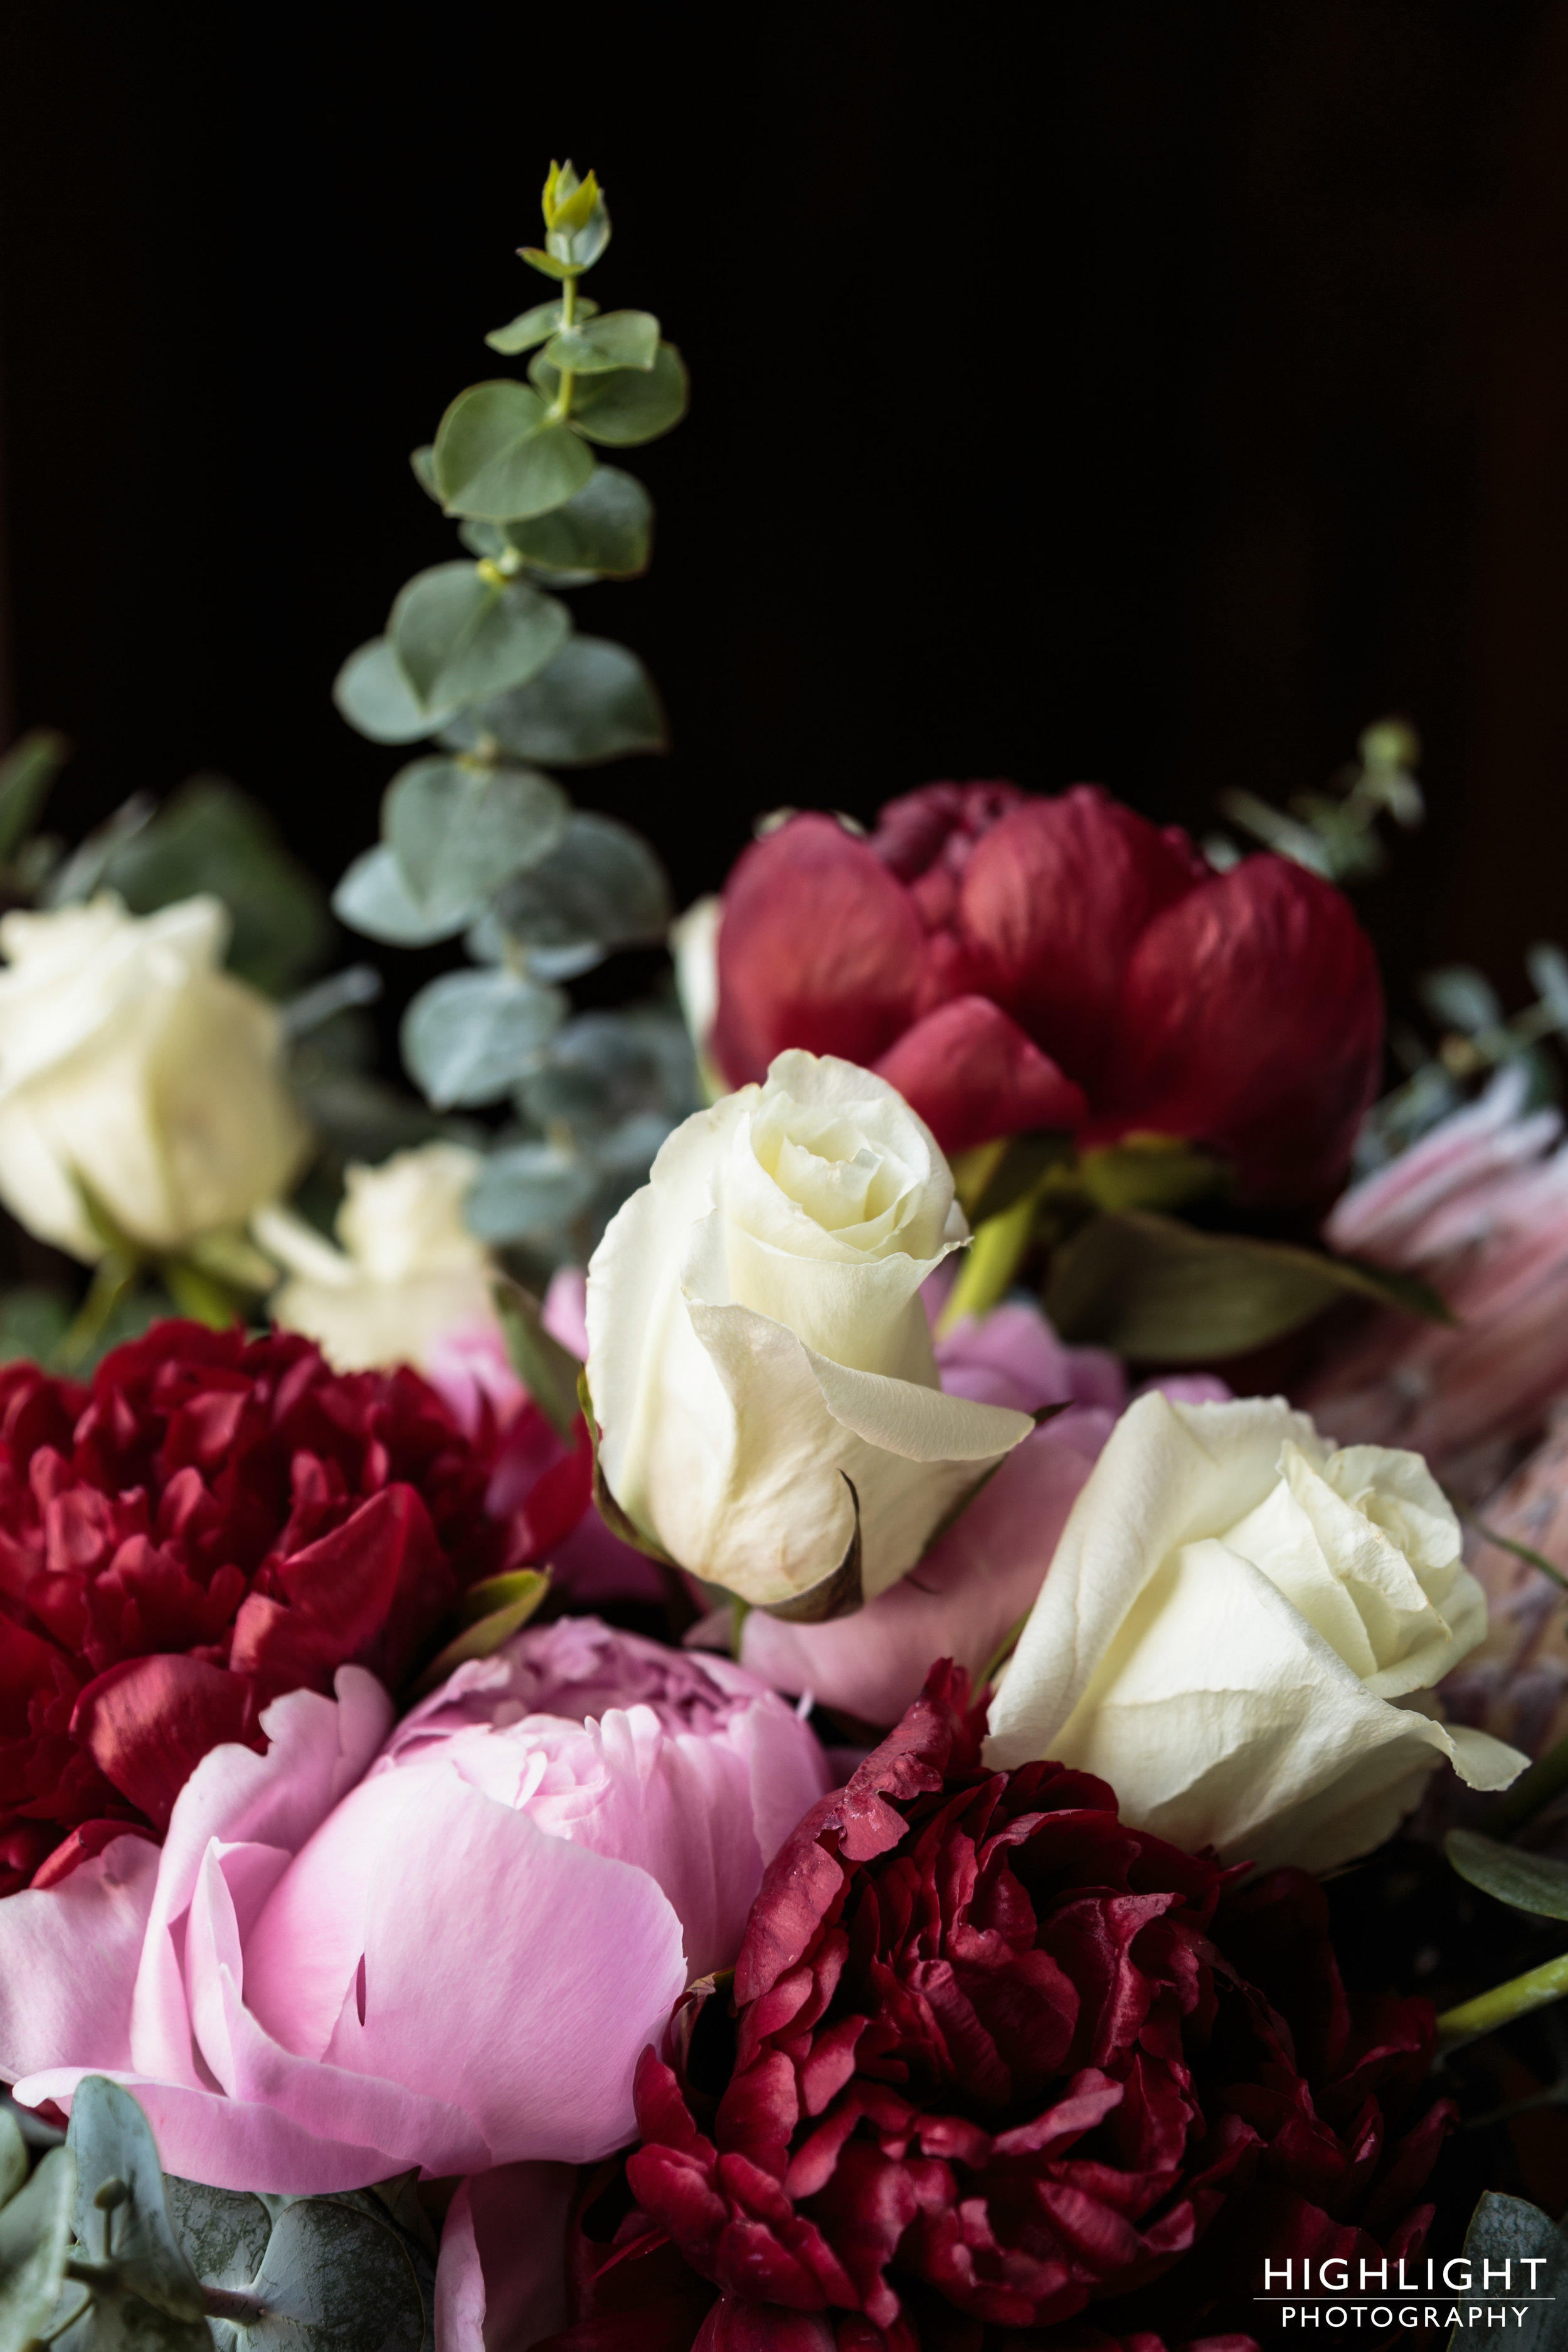 highlight-wedding-photography-new-zealand-makoura-lodge-wedding-2.jpg